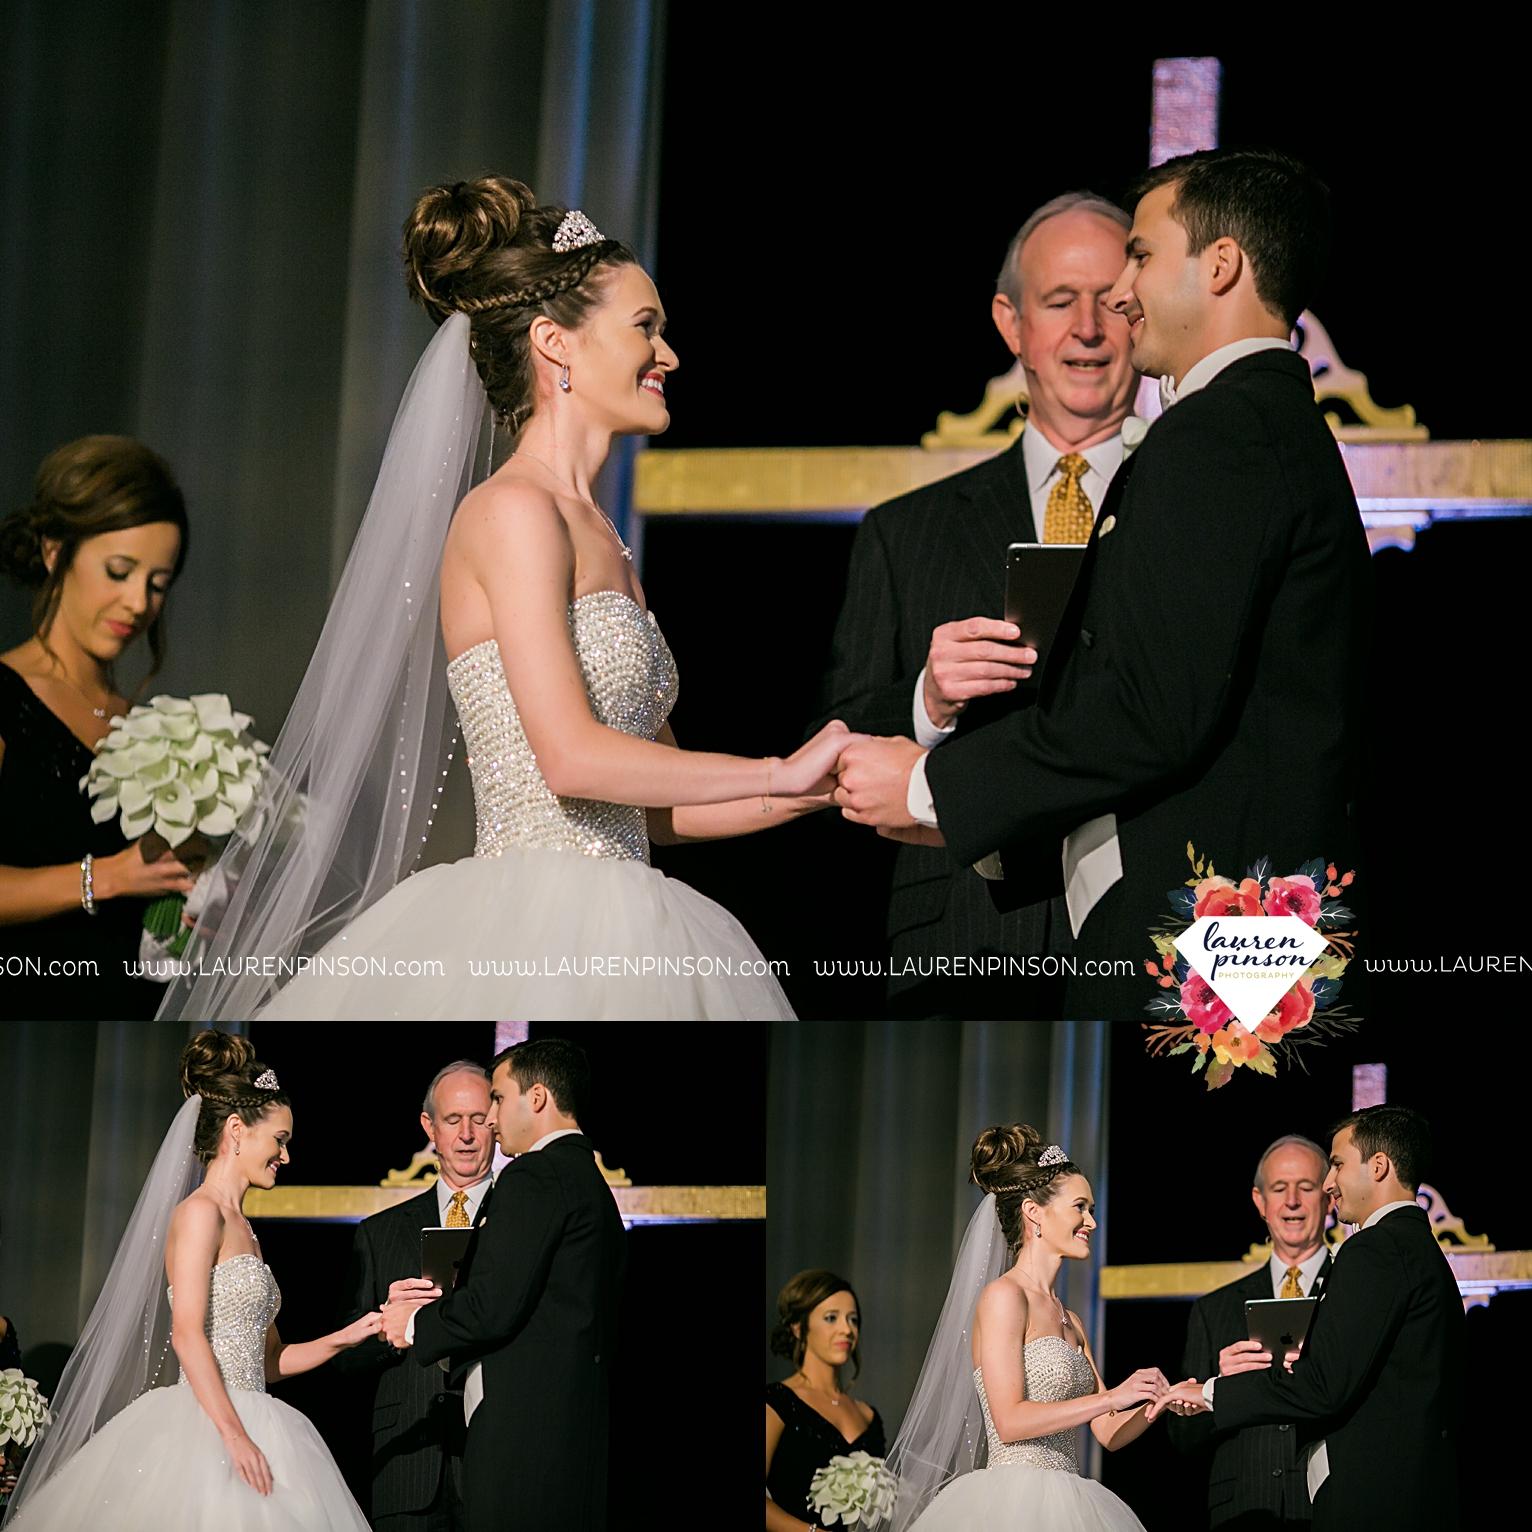 wichita-falls-texas-wedding-photographer-the-forum-by-the-kemp-mayfield-events-ulta-gold-glitter_2865.jpg